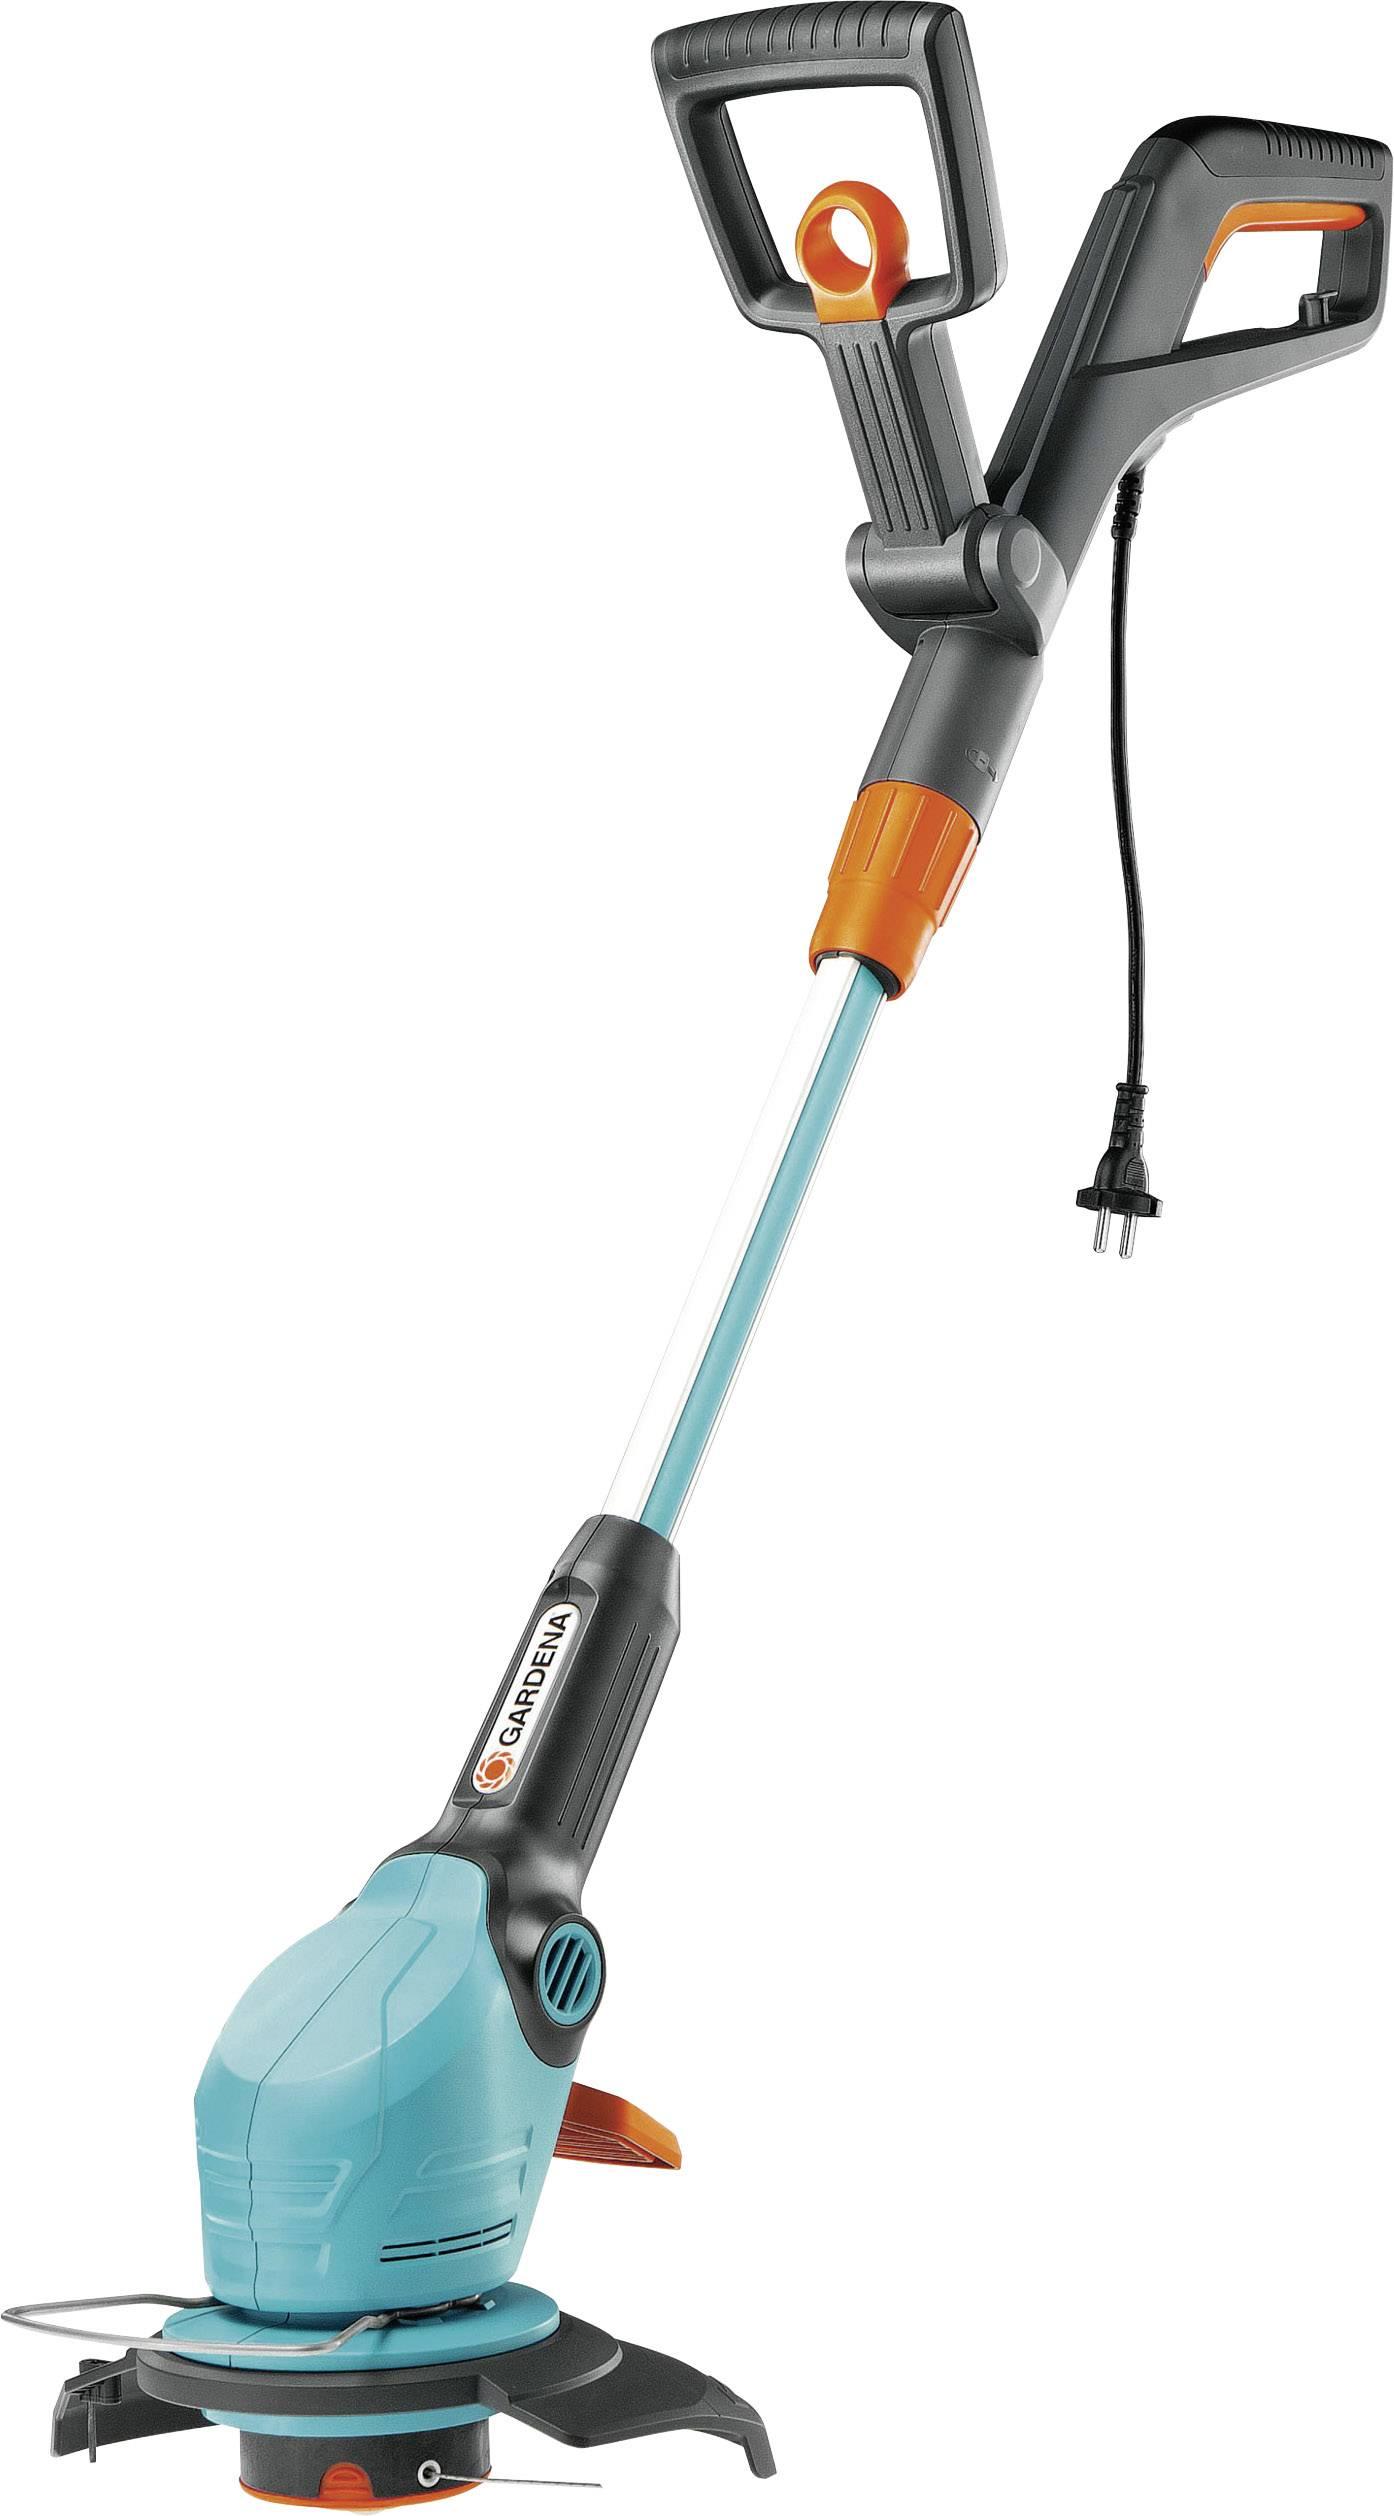 Elektrická strunová sekačka Gardena EasyCut 400/25, 09807-20, 400 W, 250 mm